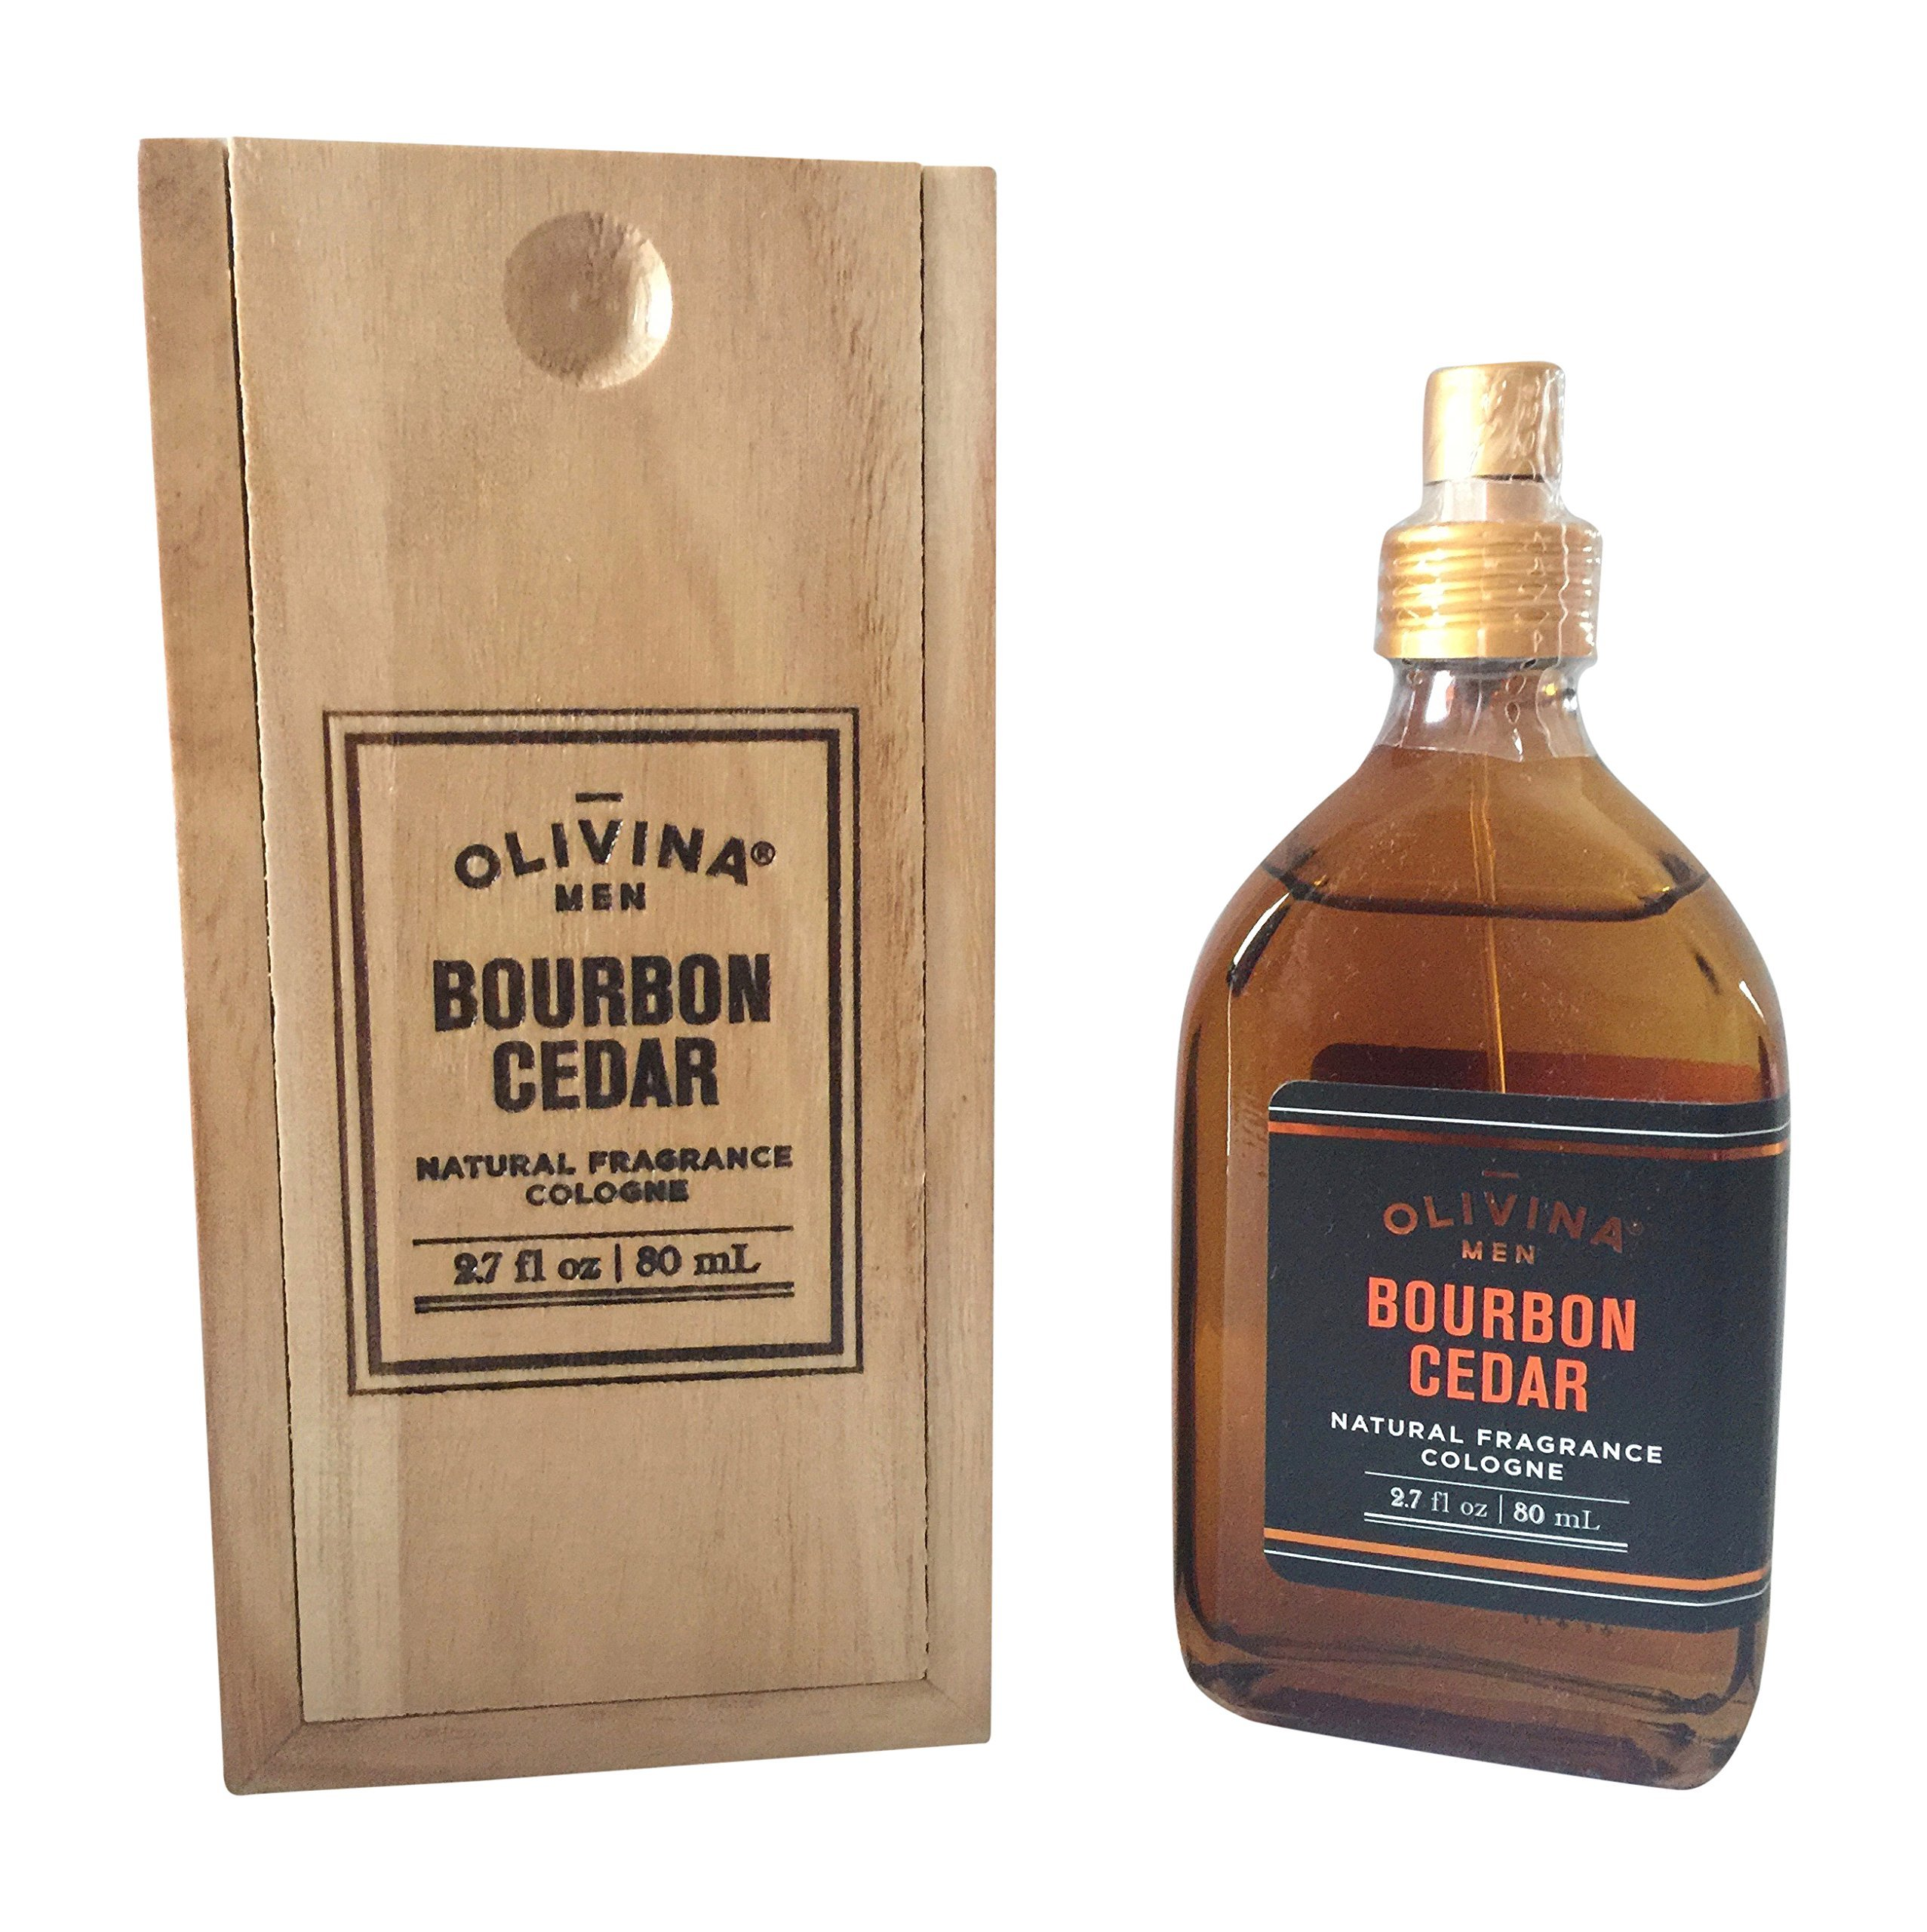 Olivina, Cologne Bourbon Cedar Boxed, 2.7 Fl Oz